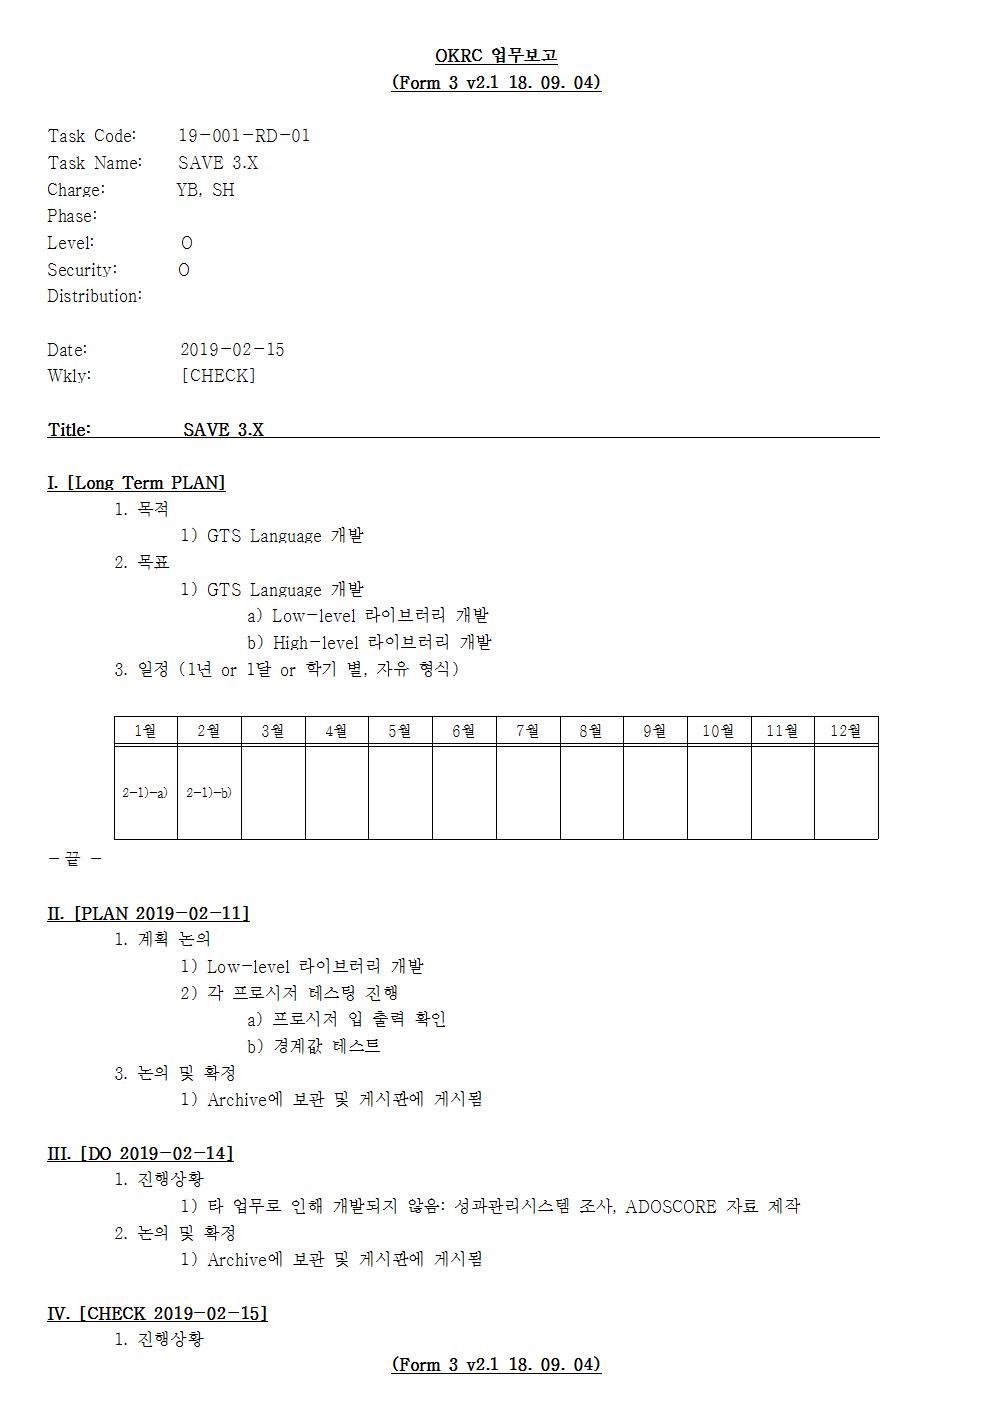 D-[19-001-RD-01]-[SAVE 3.X]-[2019-02-15][SH]001.jpg